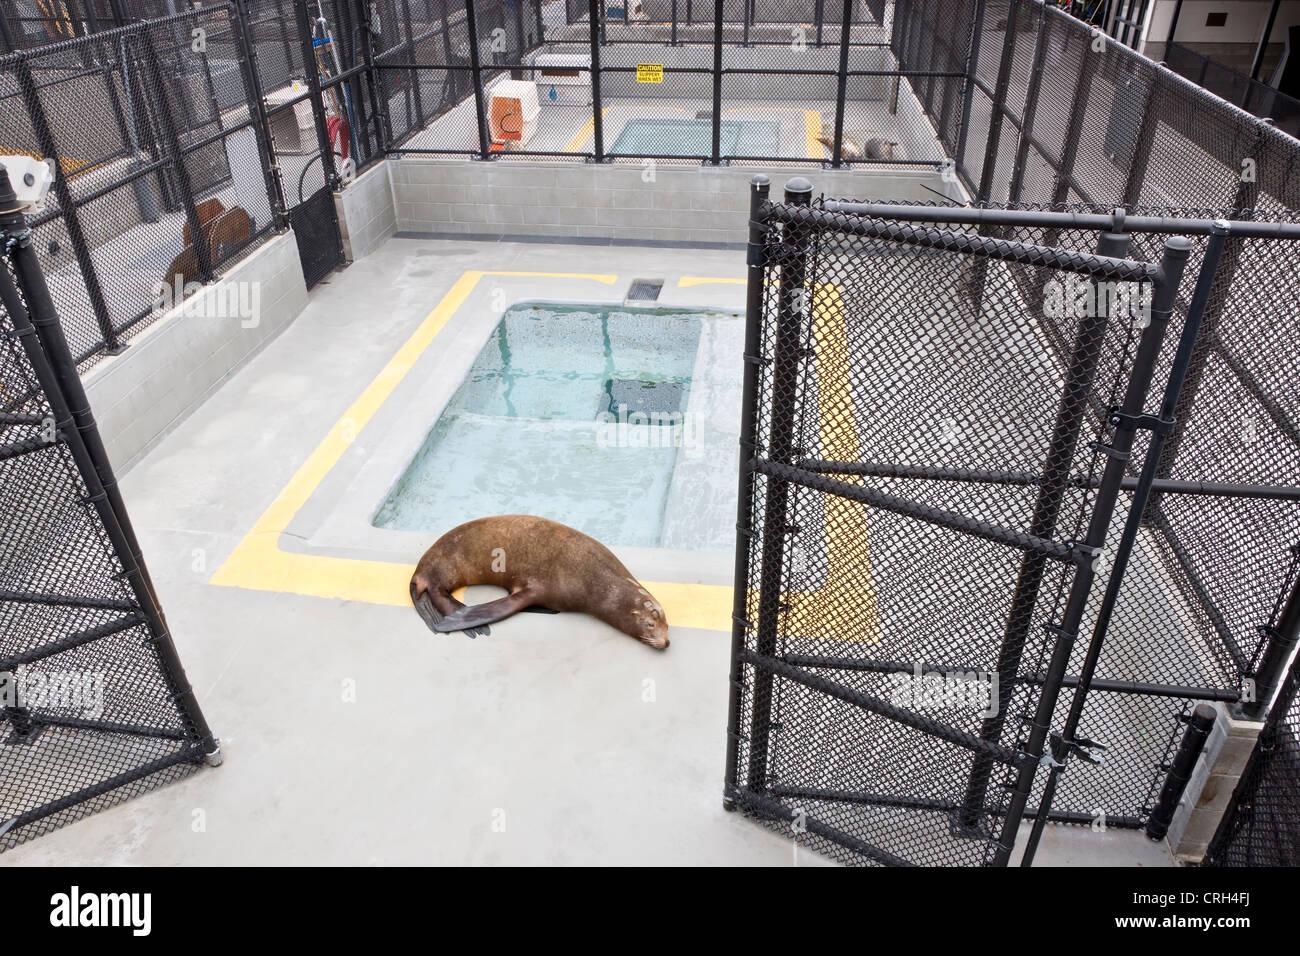 Rescued rehabilitated Sea Lion, Marine Mammal Center. - Stock Image